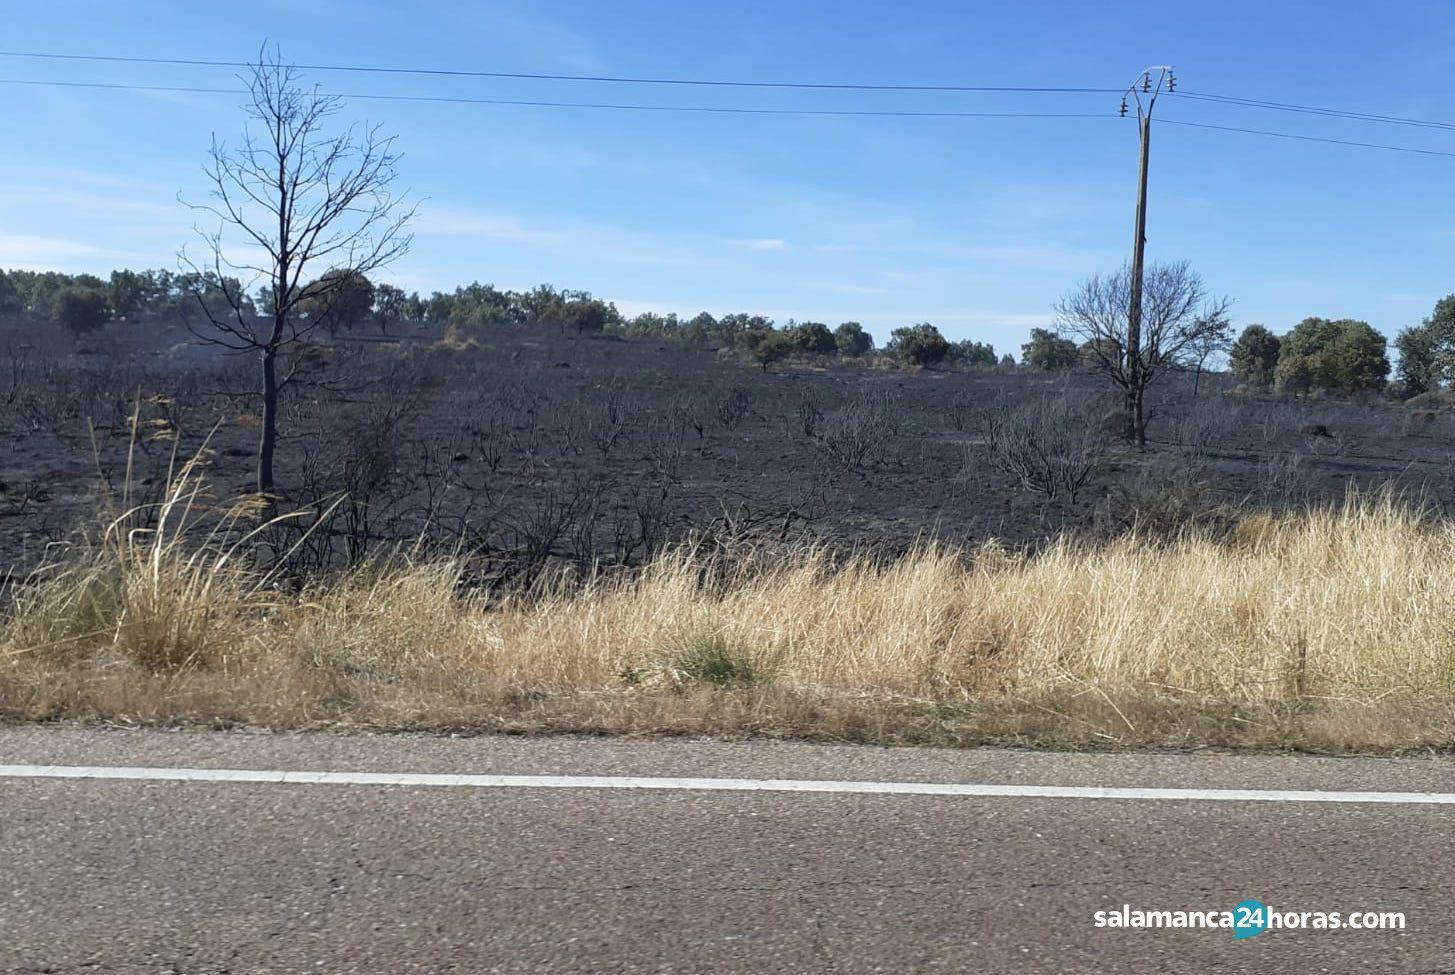 Incendio trabancaWhatsApp Image 2020 09 07 at 12.02.05 (2)